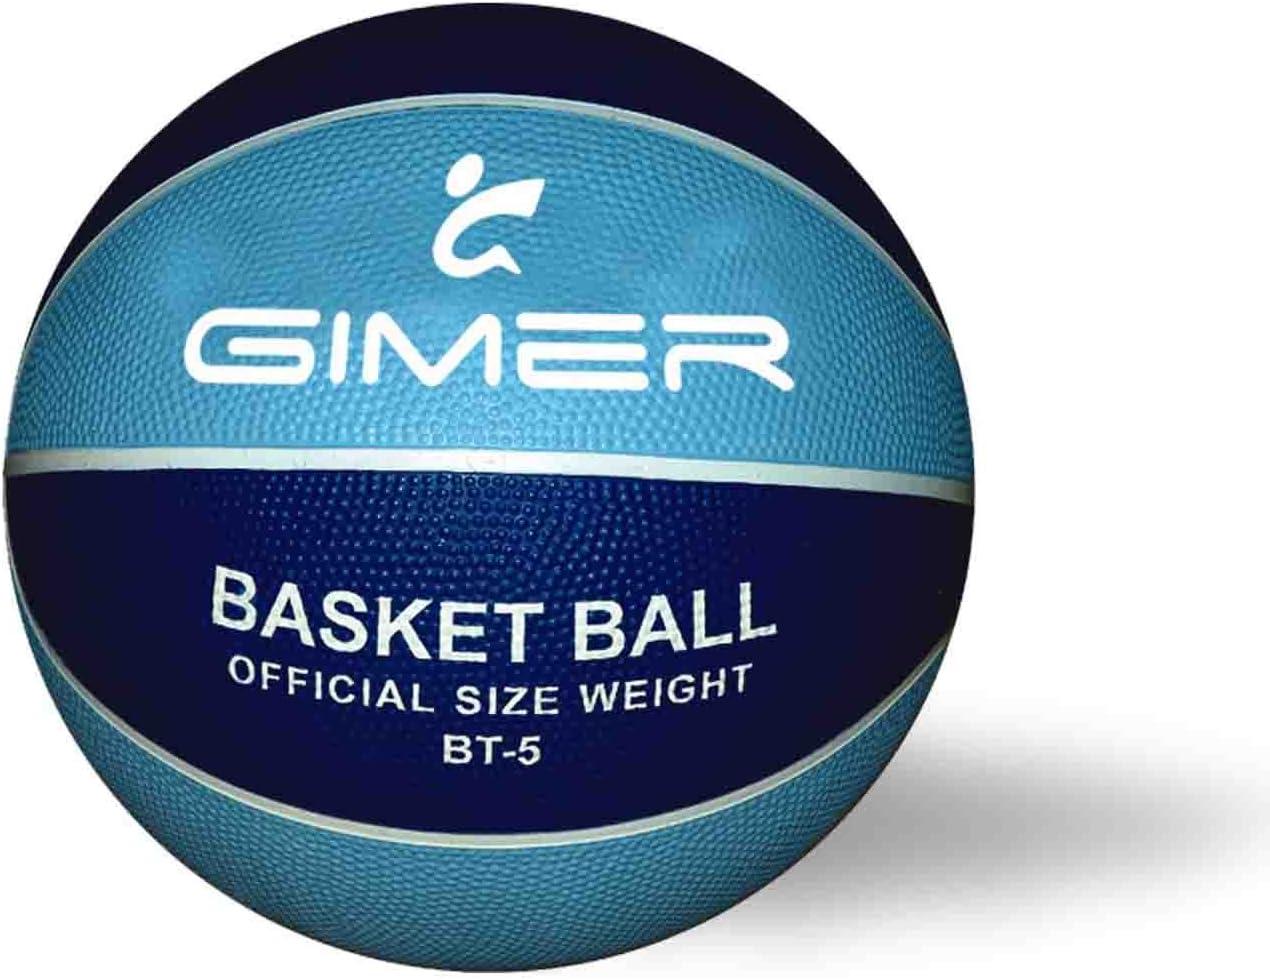 GIMER, balón Baloncesto Unisex Infantil, Azul, 28 x 16 x 7 cm ...